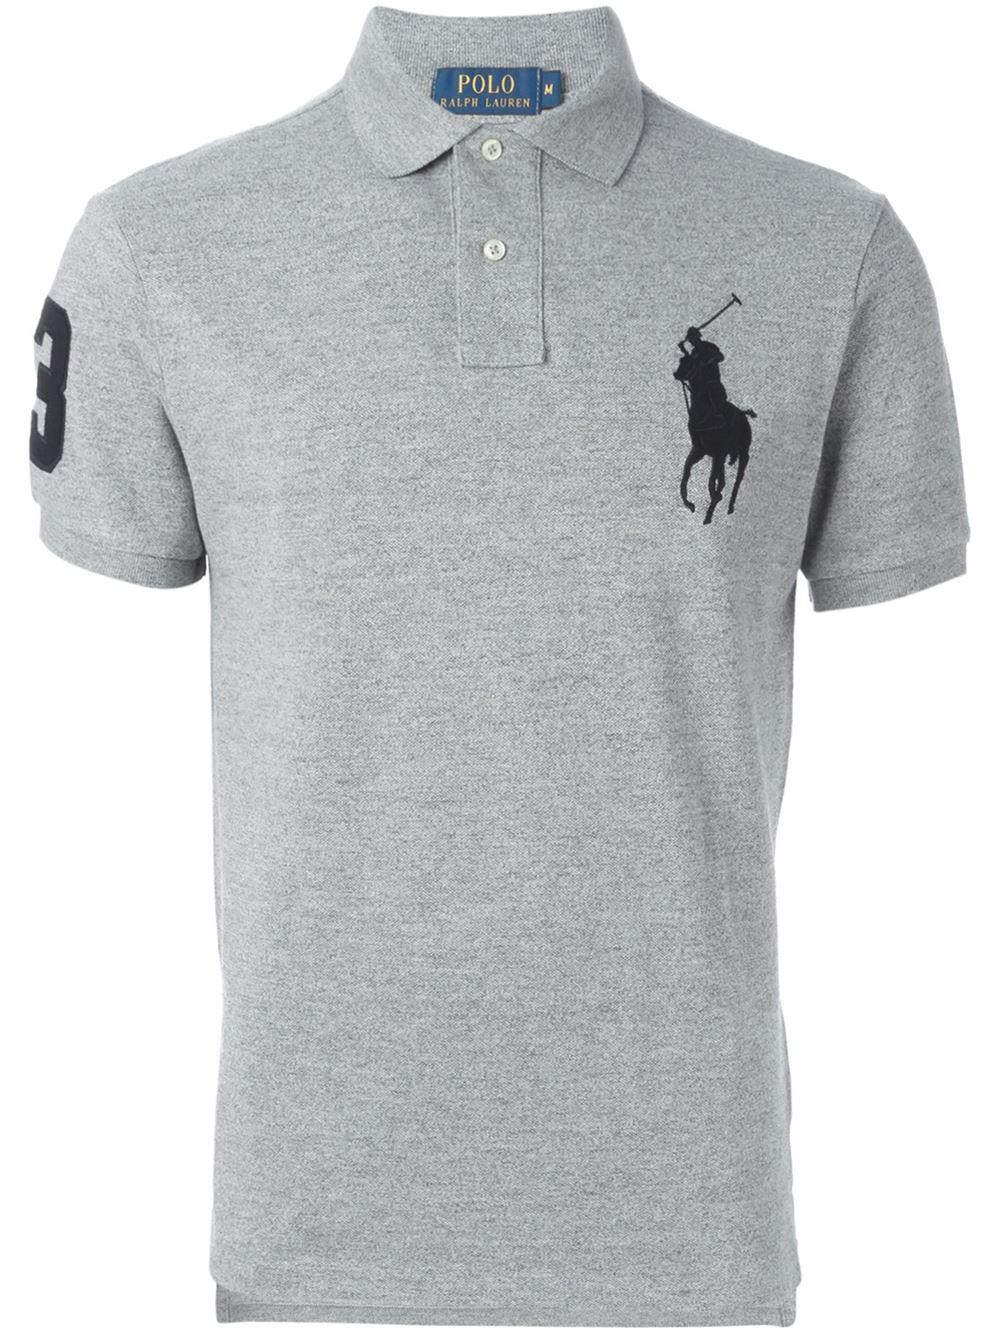 Polo Ralph Lauren Embroidered Logo Short Sleeve Polo Shirt